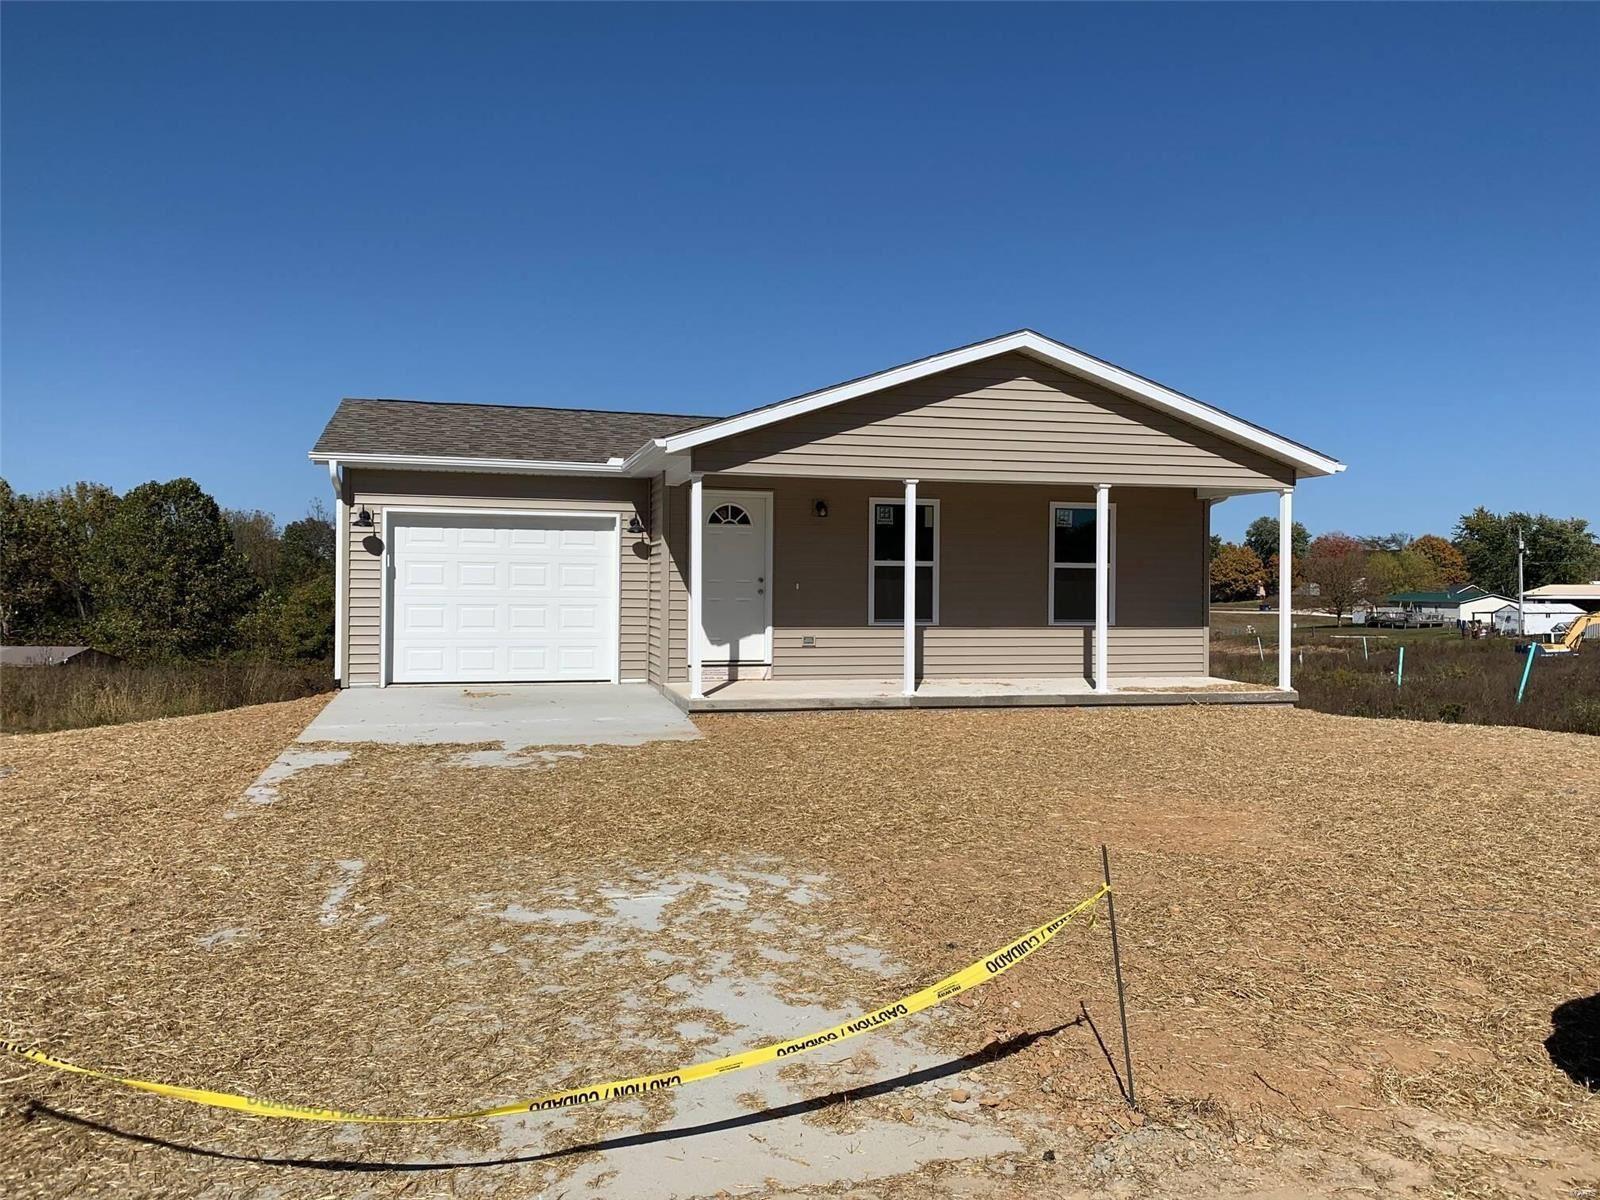 Photo of 451 Northview Estates Drive, Jackson, MO 63755 (MLS # 21068212)